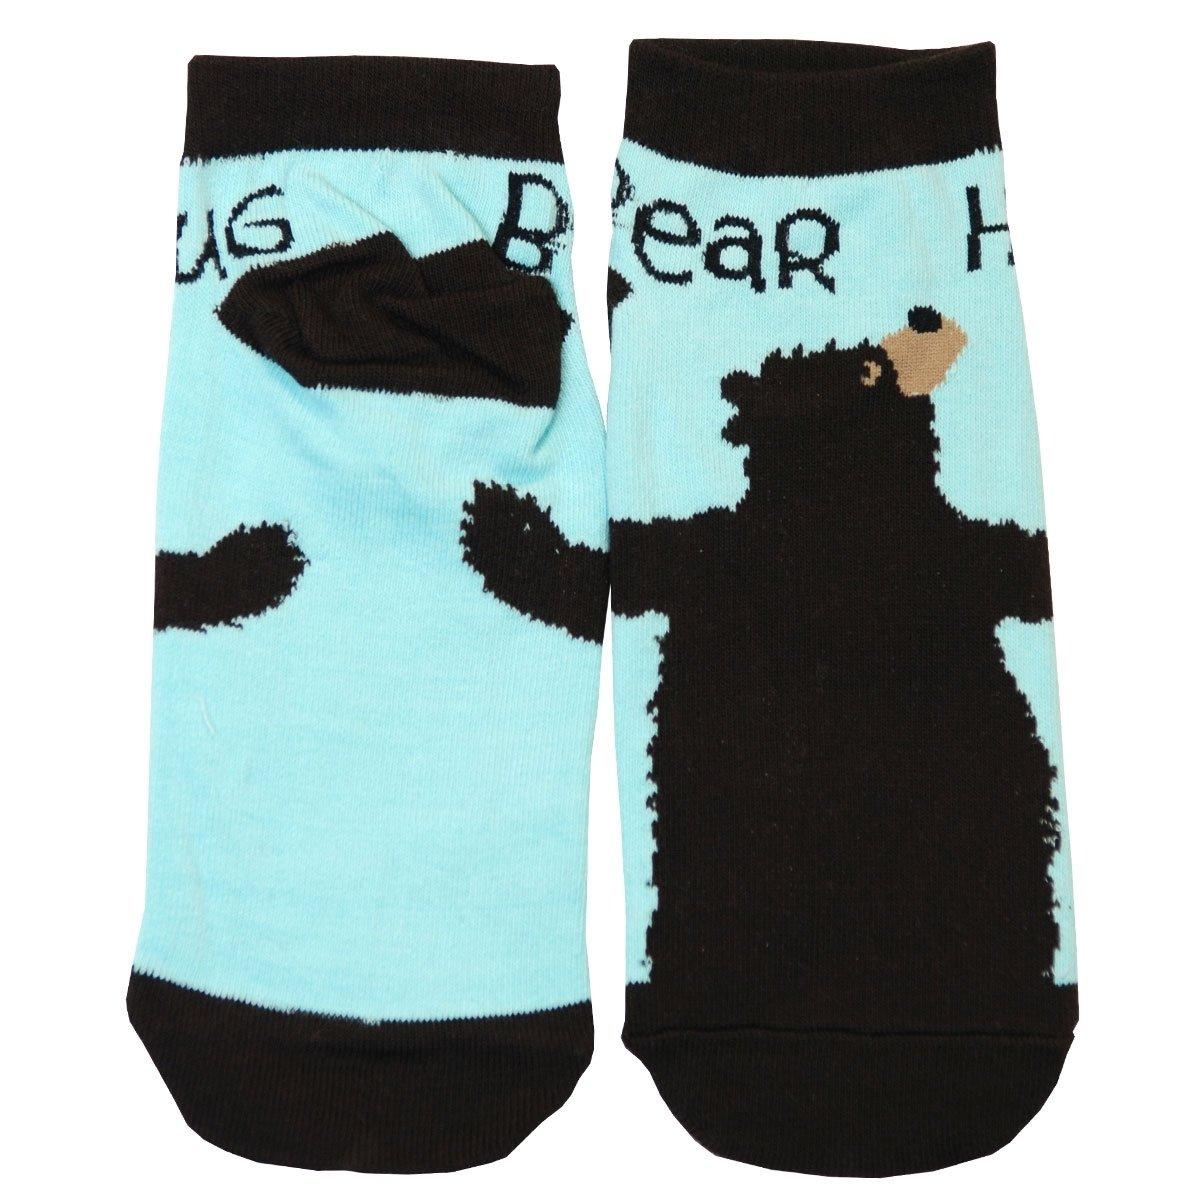 Halkstrumpor Bear Hug Blue